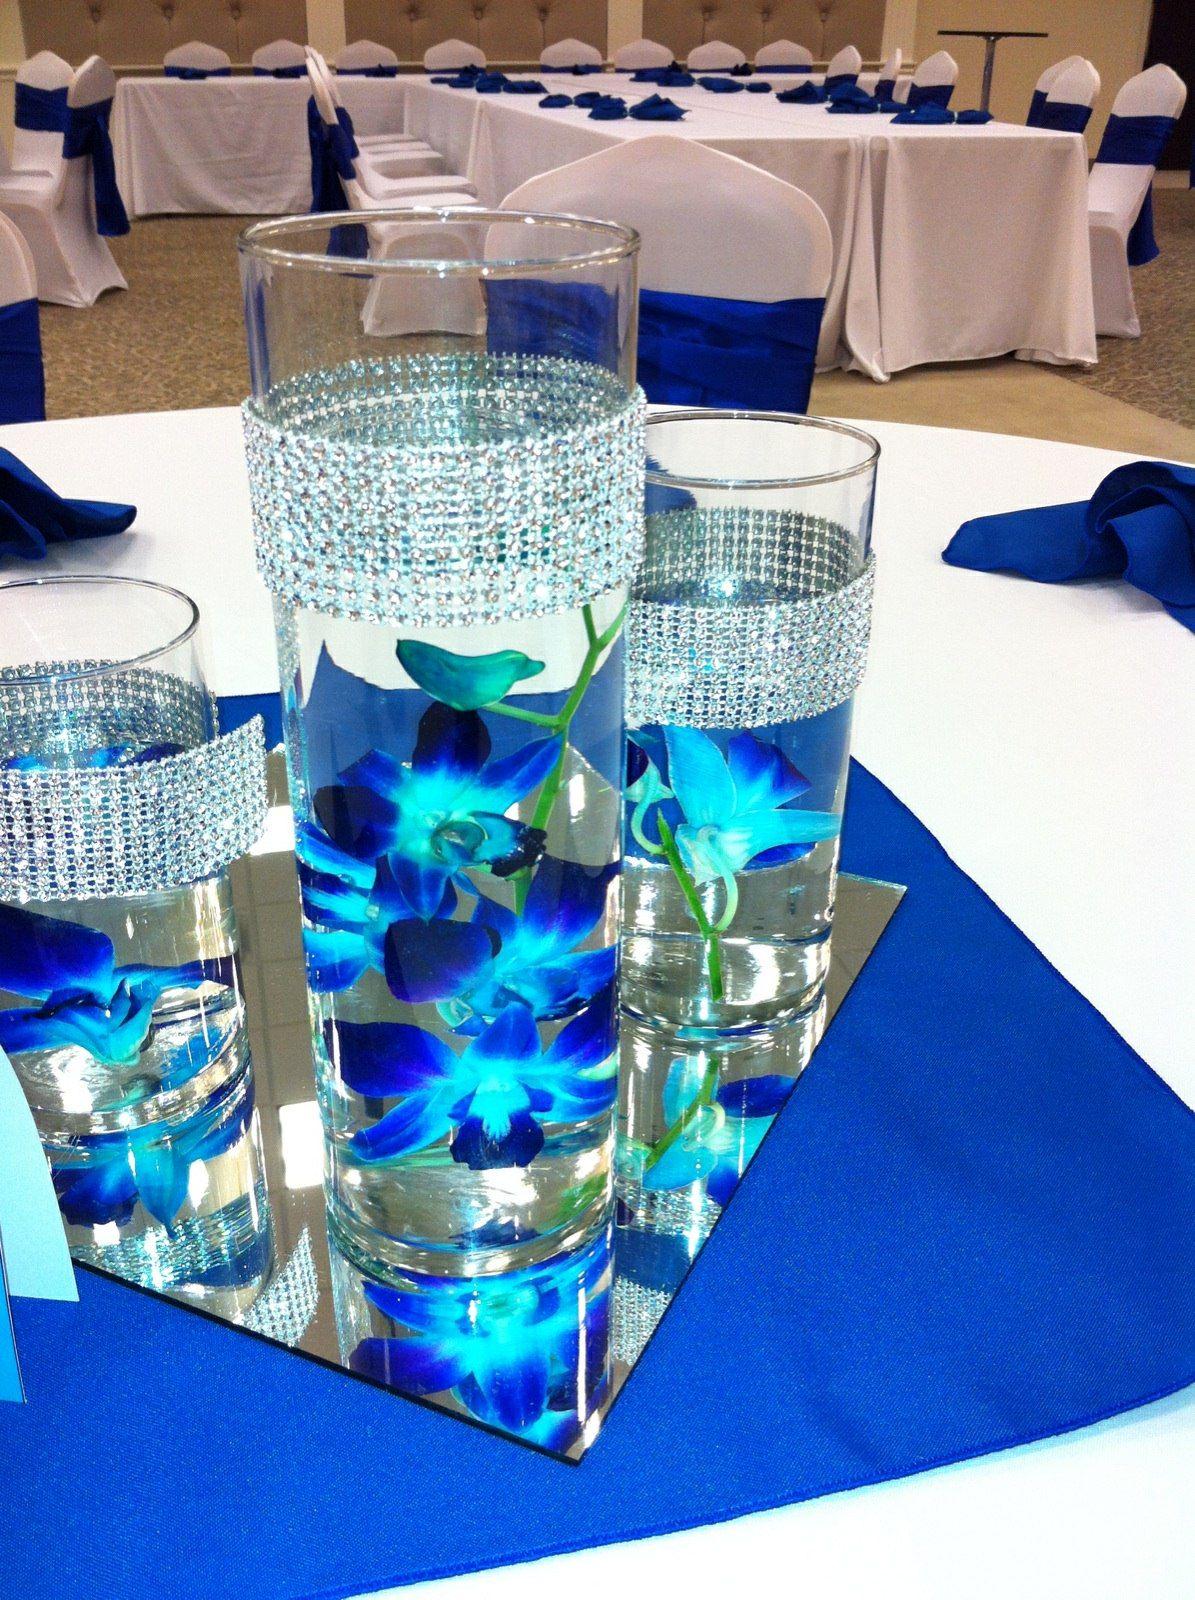 Captivating darkolivegreen blue silver centerpieces for Midnight blue centerpieces